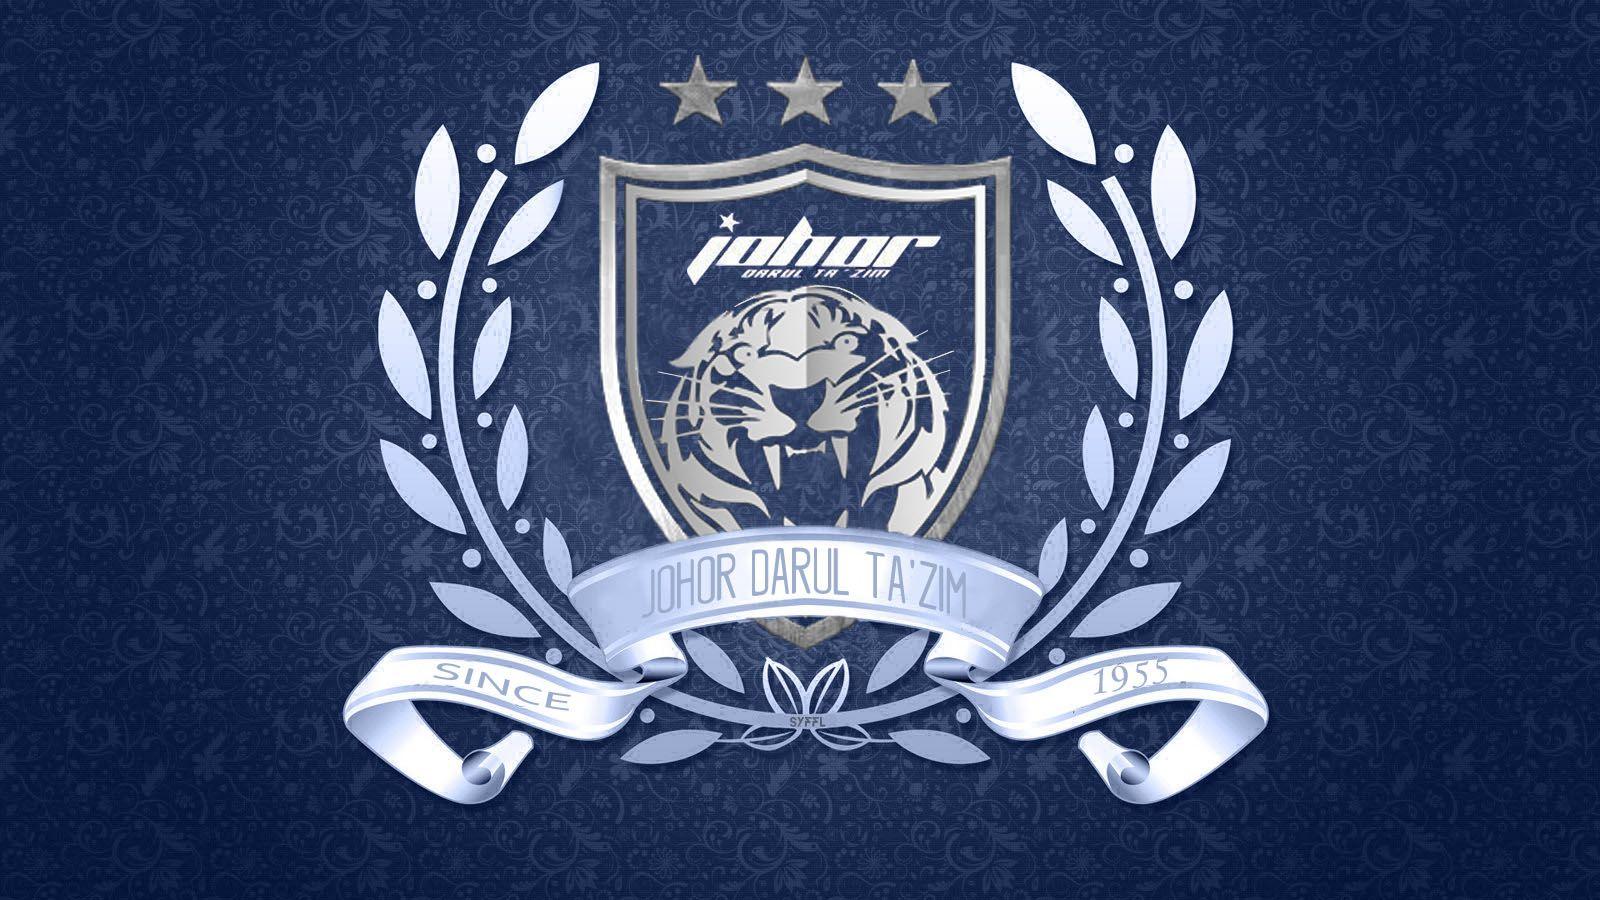 Johor Darul Takzim JDT Logo Wallpaper 06 By TheSYFFL On